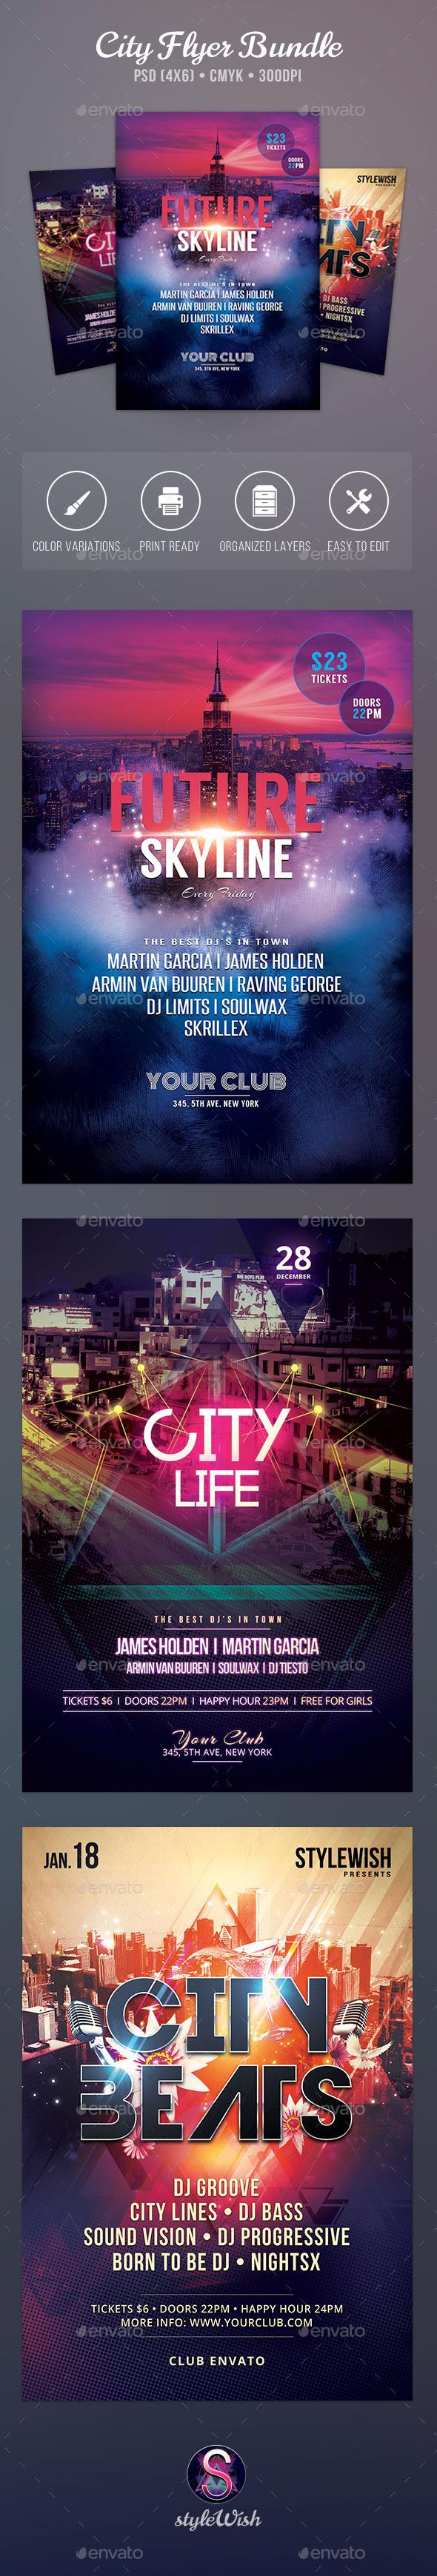 City Party Flyer Bundle - Clubs & Parties Events